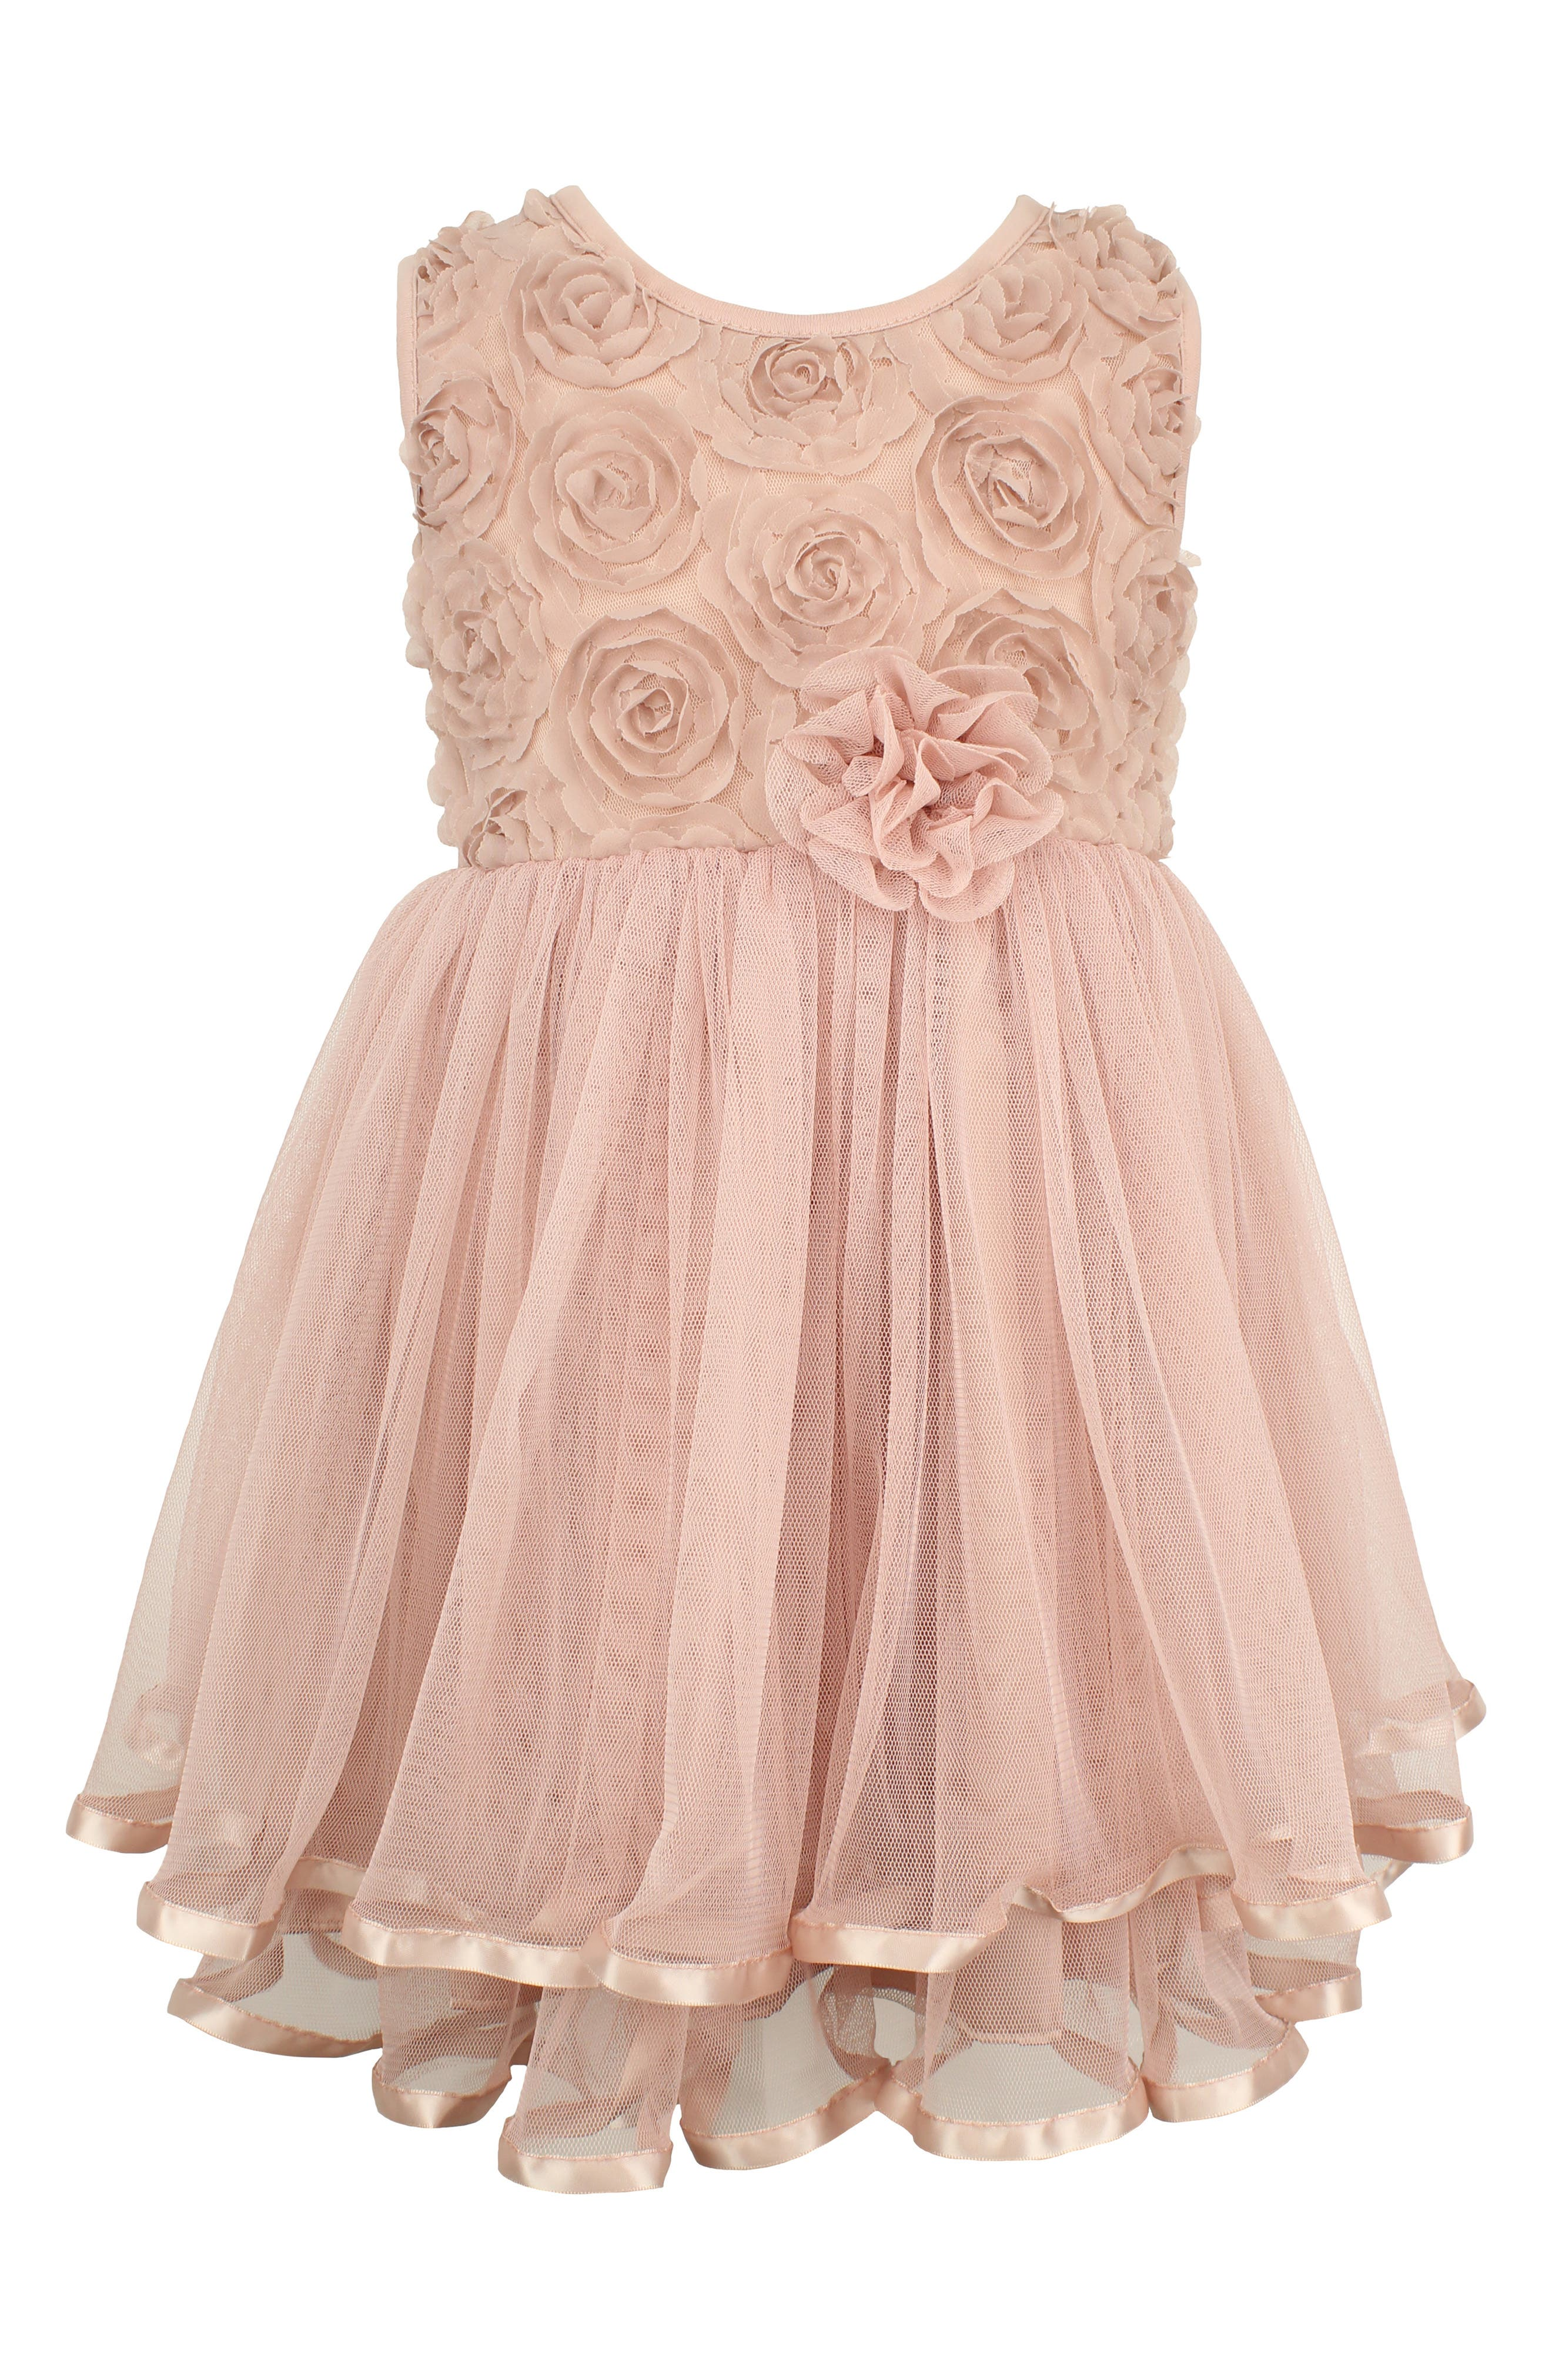 POPATU, Rosette Tulle Dress, Main thumbnail 1, color, DUSTY PINK